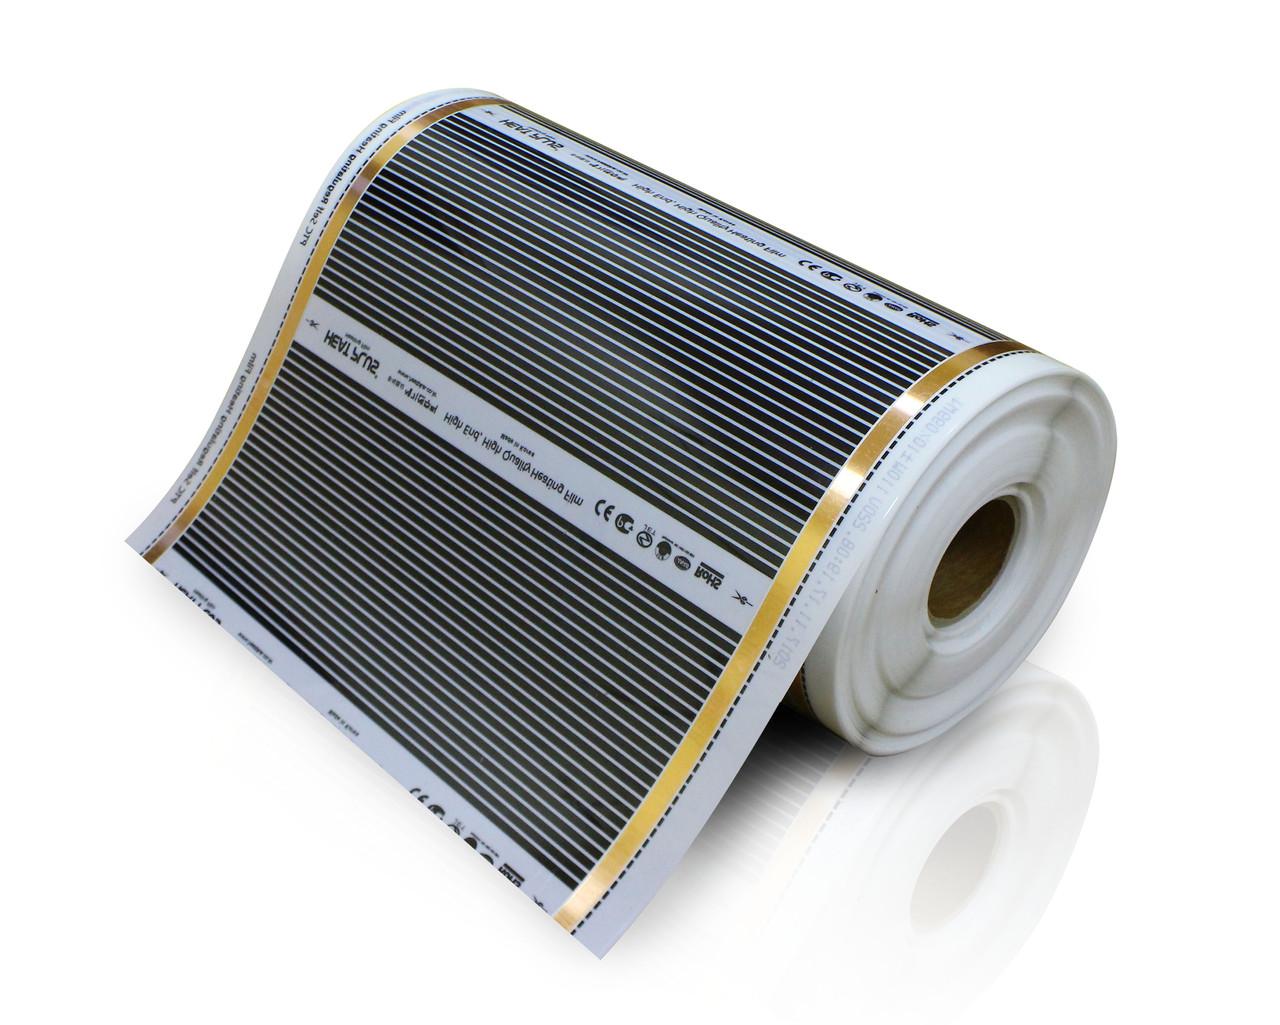 Инфракрасная плёнка для тёплого пола Heat Plus SPР-305-110 РТС теплый пол